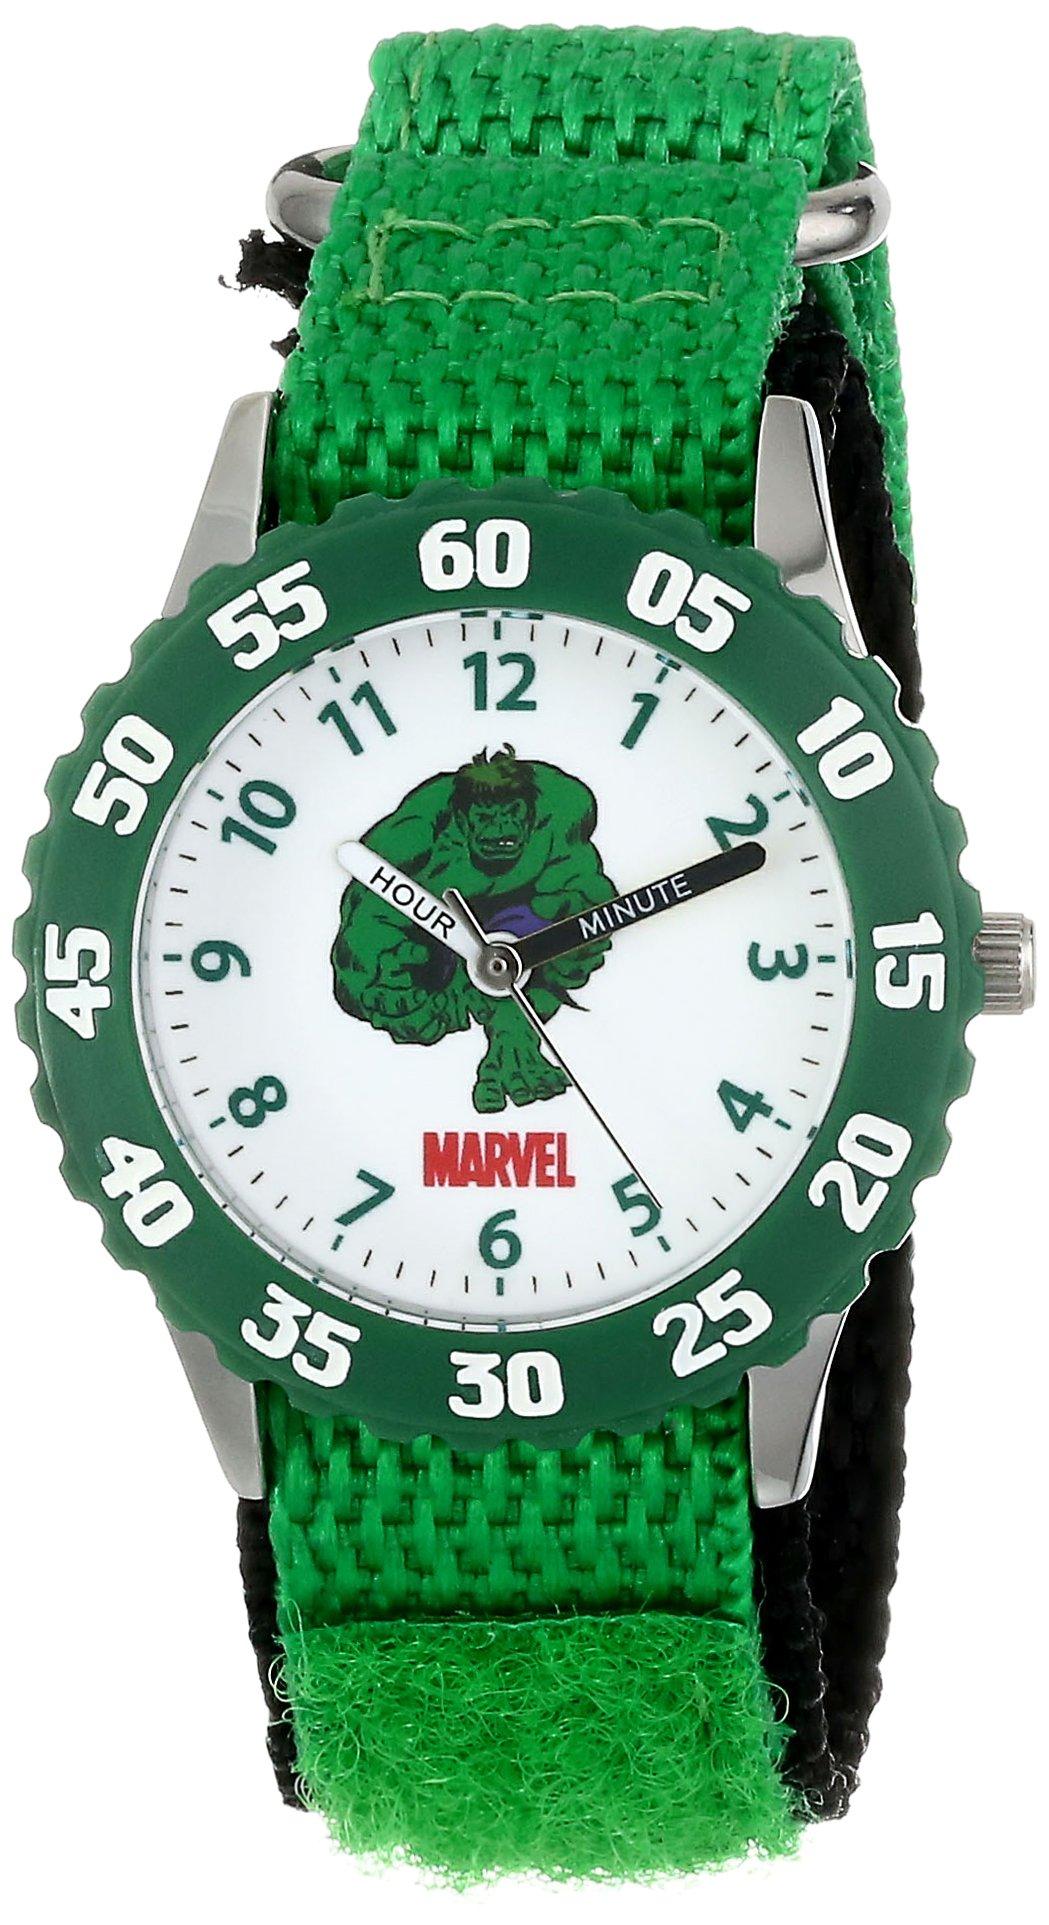 Marvel Kids' W001478 Hulk Stainless Steel with Green Bezel, Green Nylon Strap, Analog Display, Analog Quartz, Green Watch by Marvel